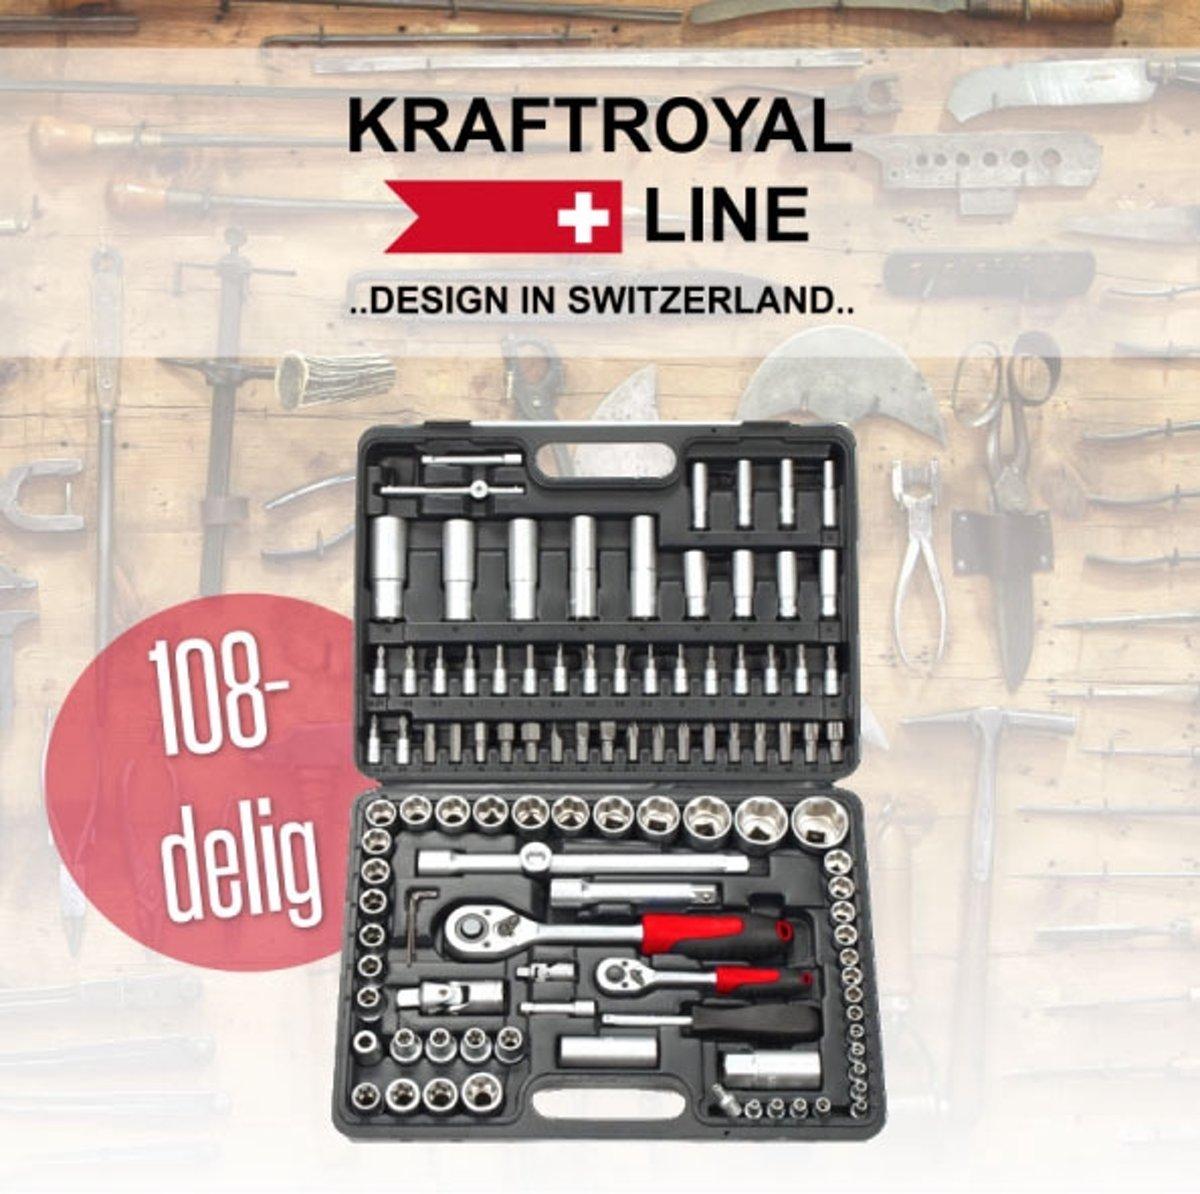 Kraft Royal Line 108-delige gereedschapsset